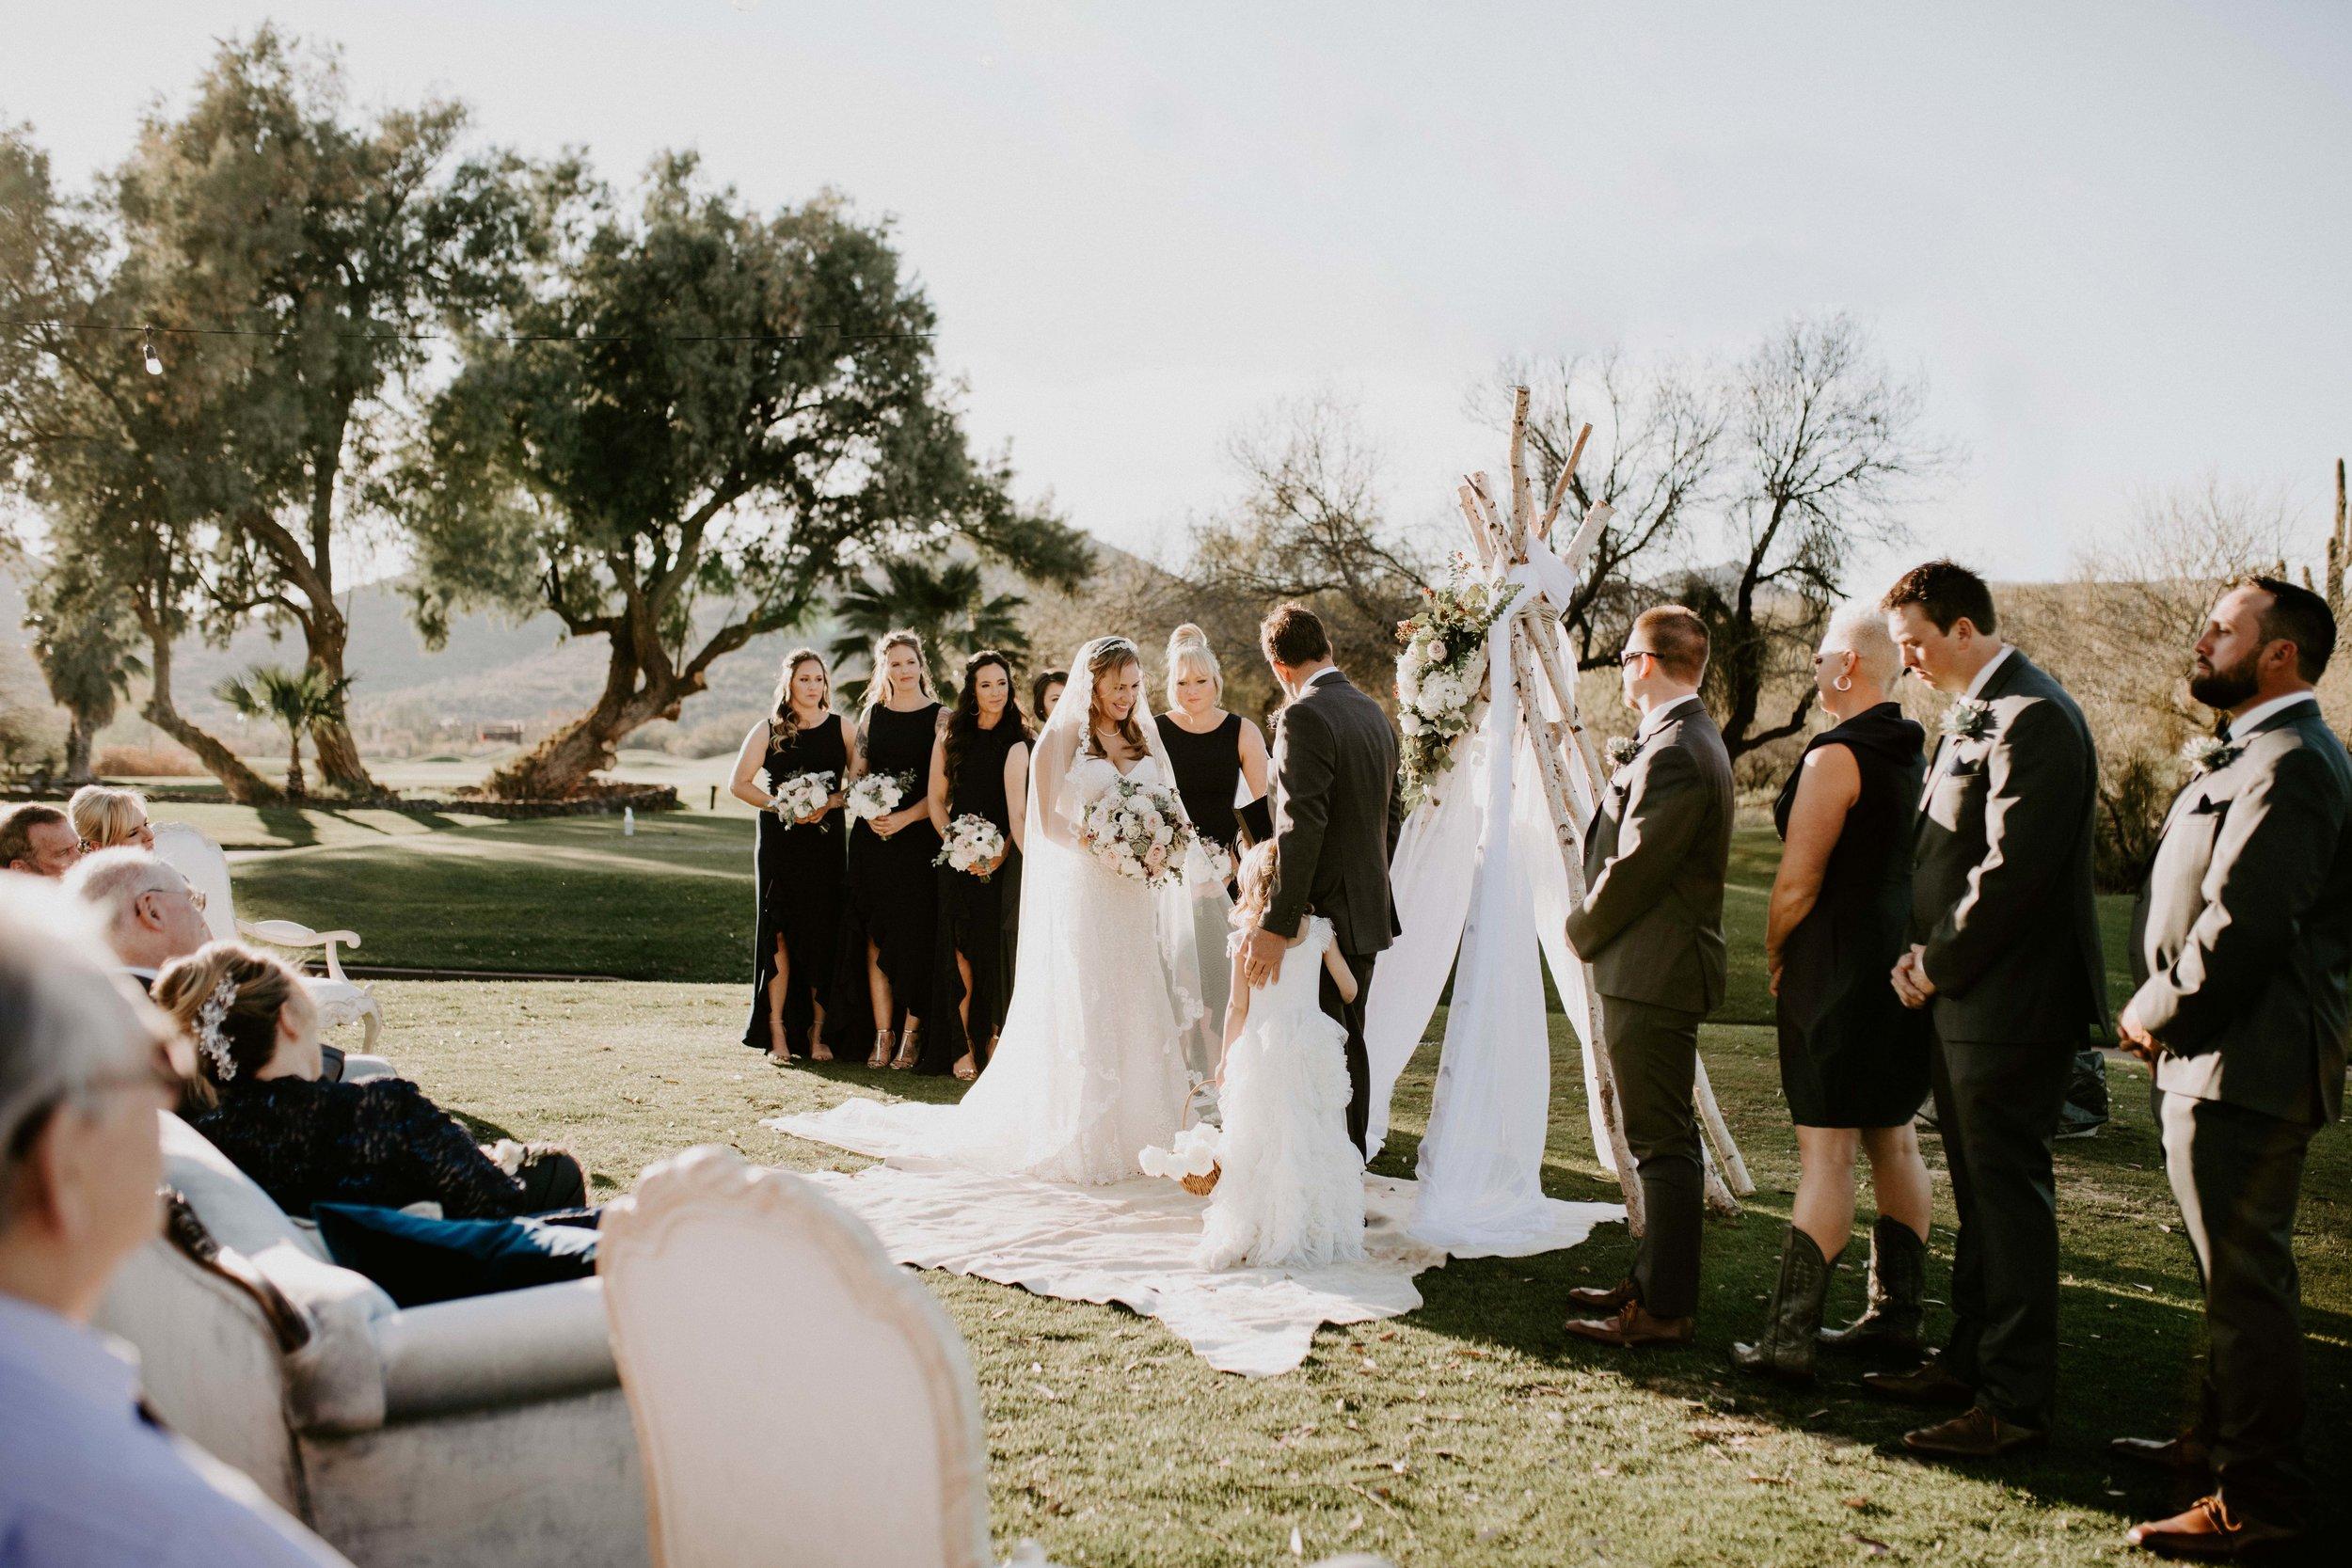 katieandbridgerwedding404.jpg